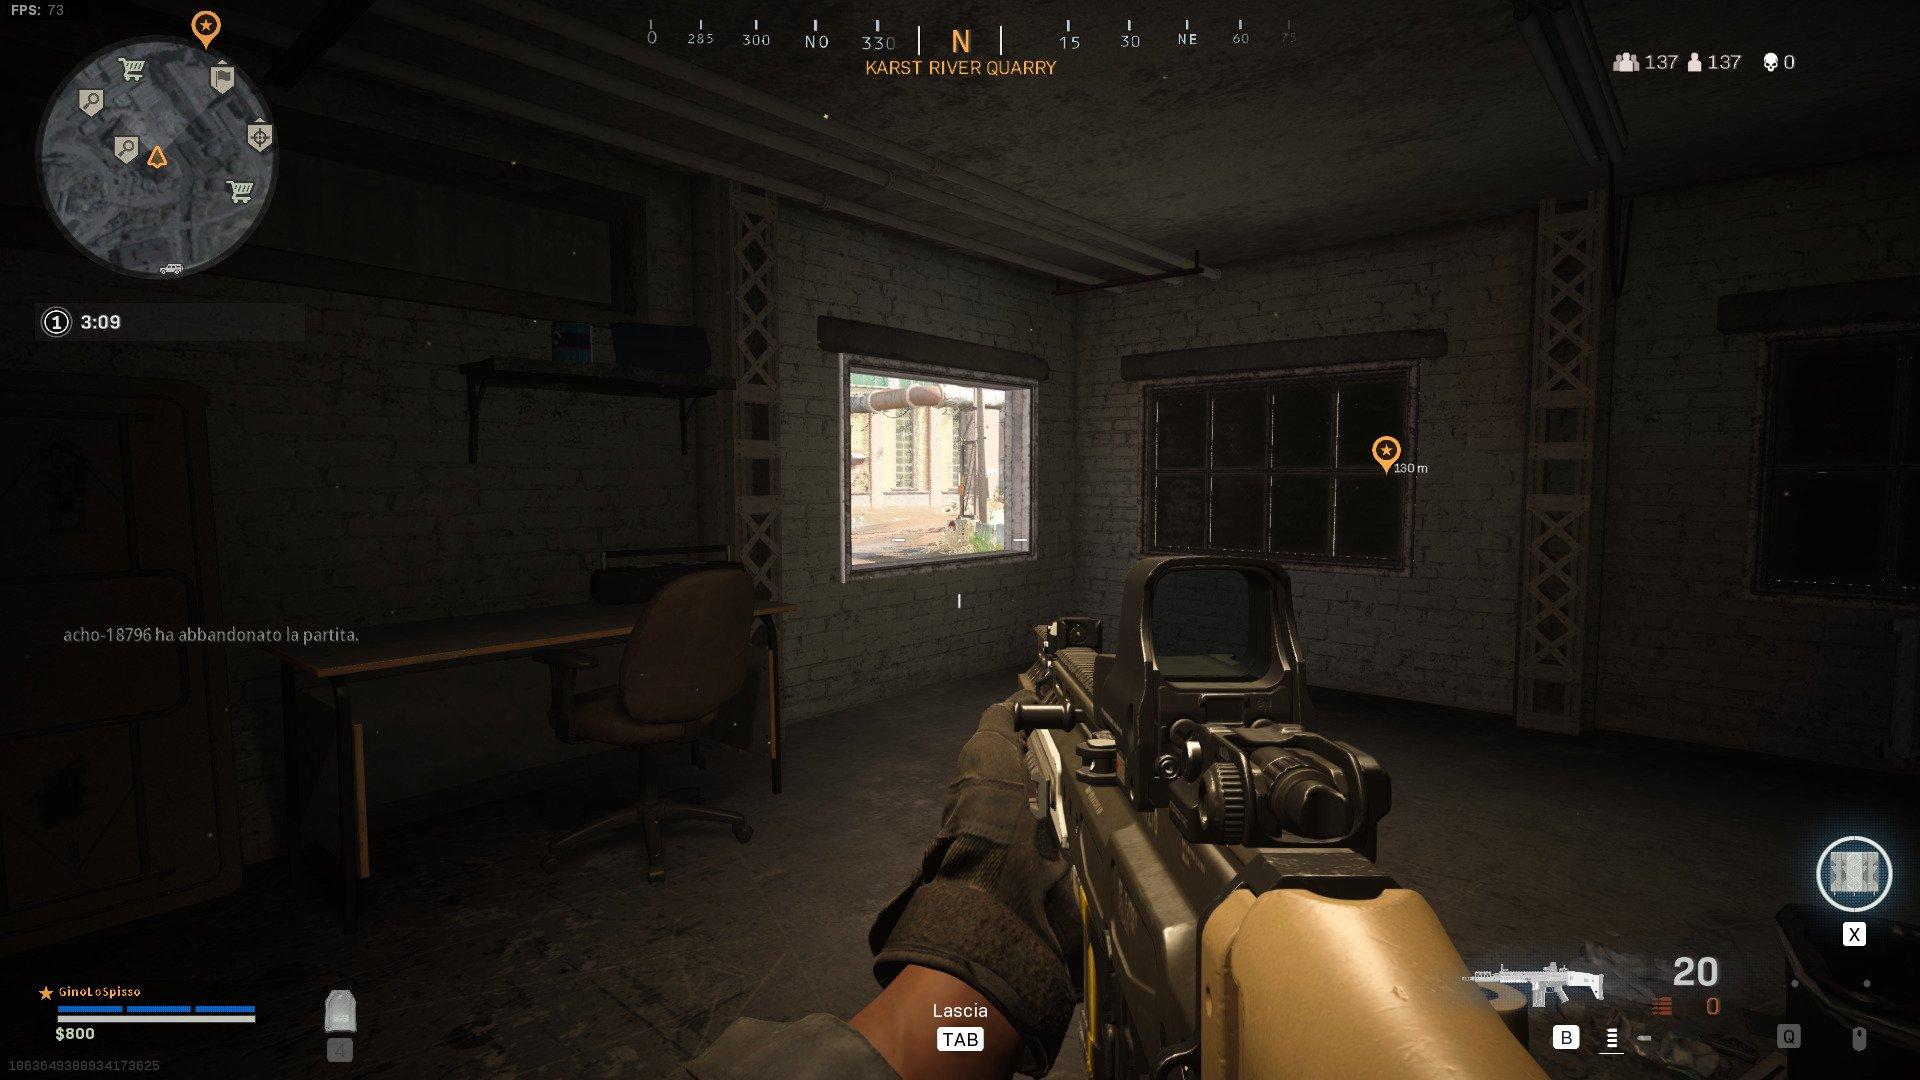 Call of Duty: Warzone Call of Duty Warzone